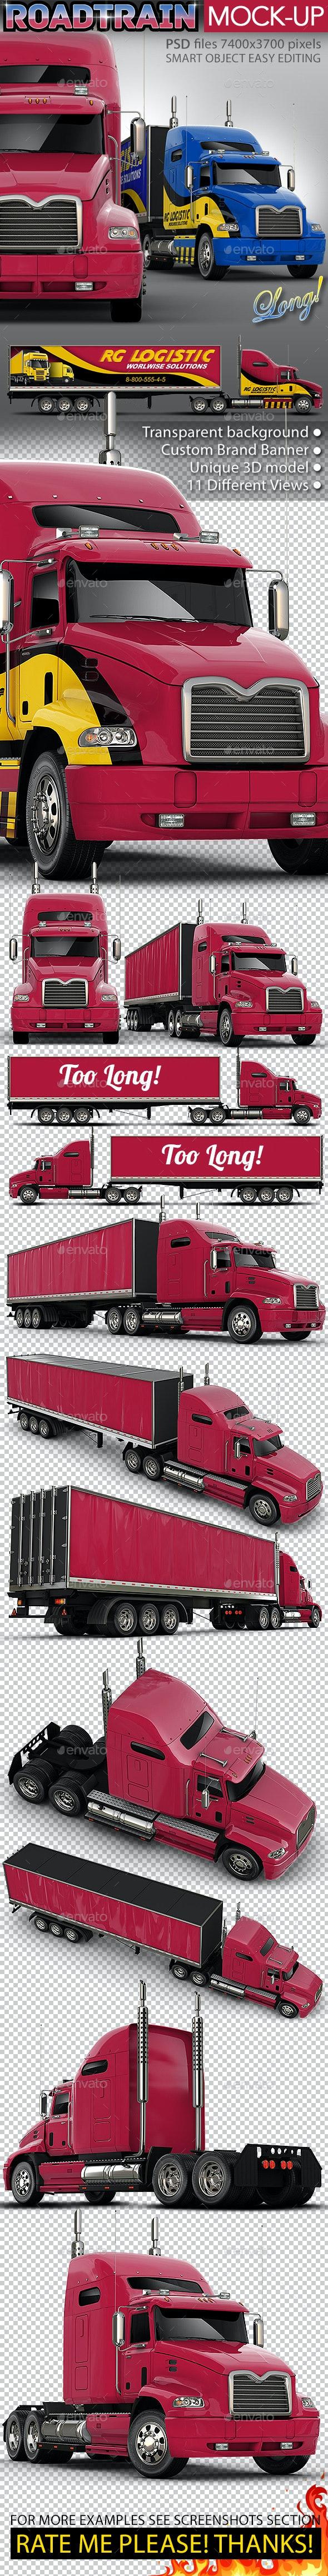 Semi-Trailer Truck Mock-up Based Mack Pinnacle - Vehicle Wraps Print